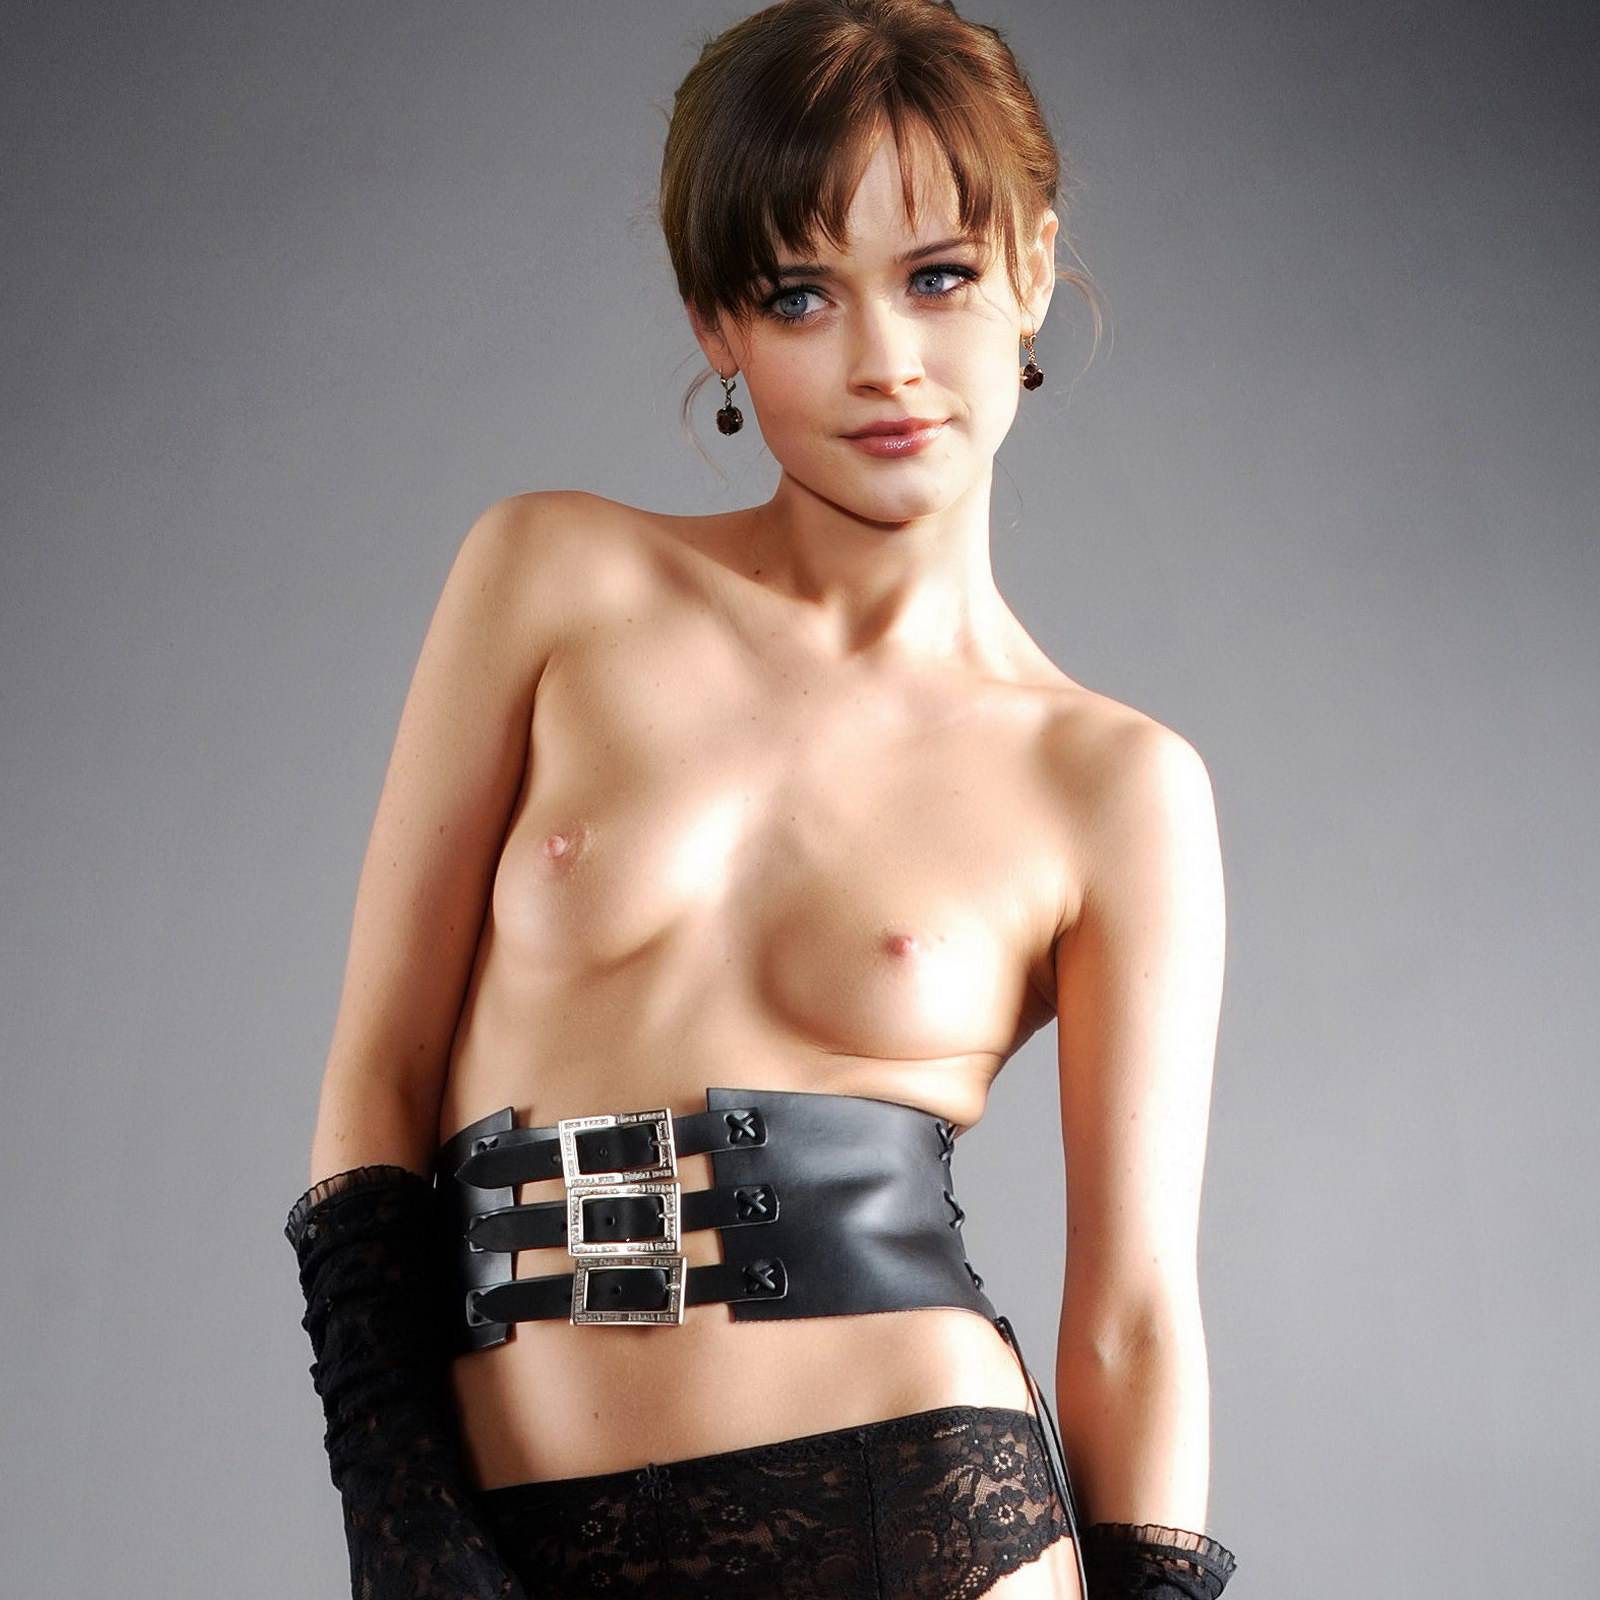 http://2.bp.blogspot.com/-HYvGRjDU0Mc/T3RWZTMDUMI/AAAAAAAAAIQ/0EuyDXGVNBY/s1600/Alexis+Bledel+nude+photosession+UHQ.jpg